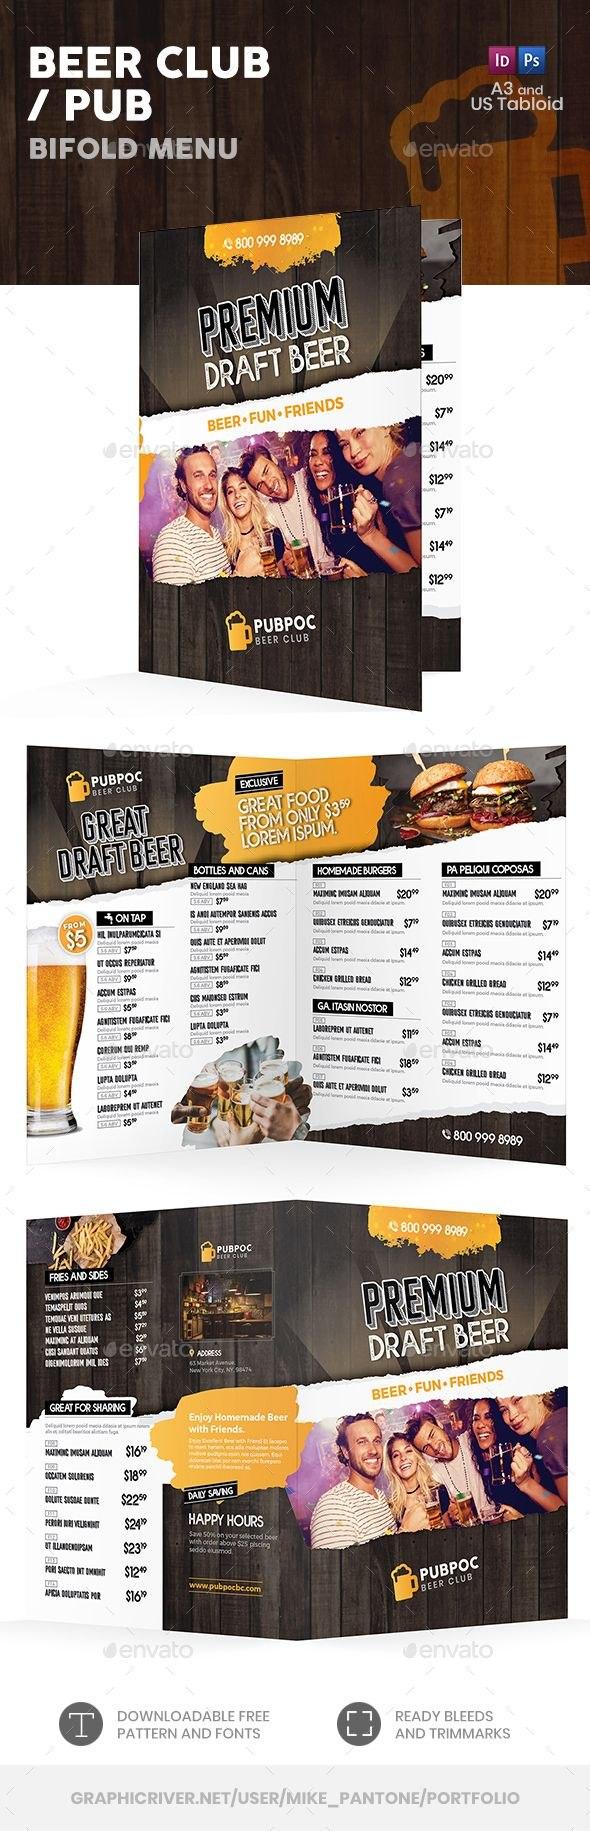 Beer Club Or Pub Bifold  Halffold Menu Template Psd Indesign Inside Half Fold Menu Template